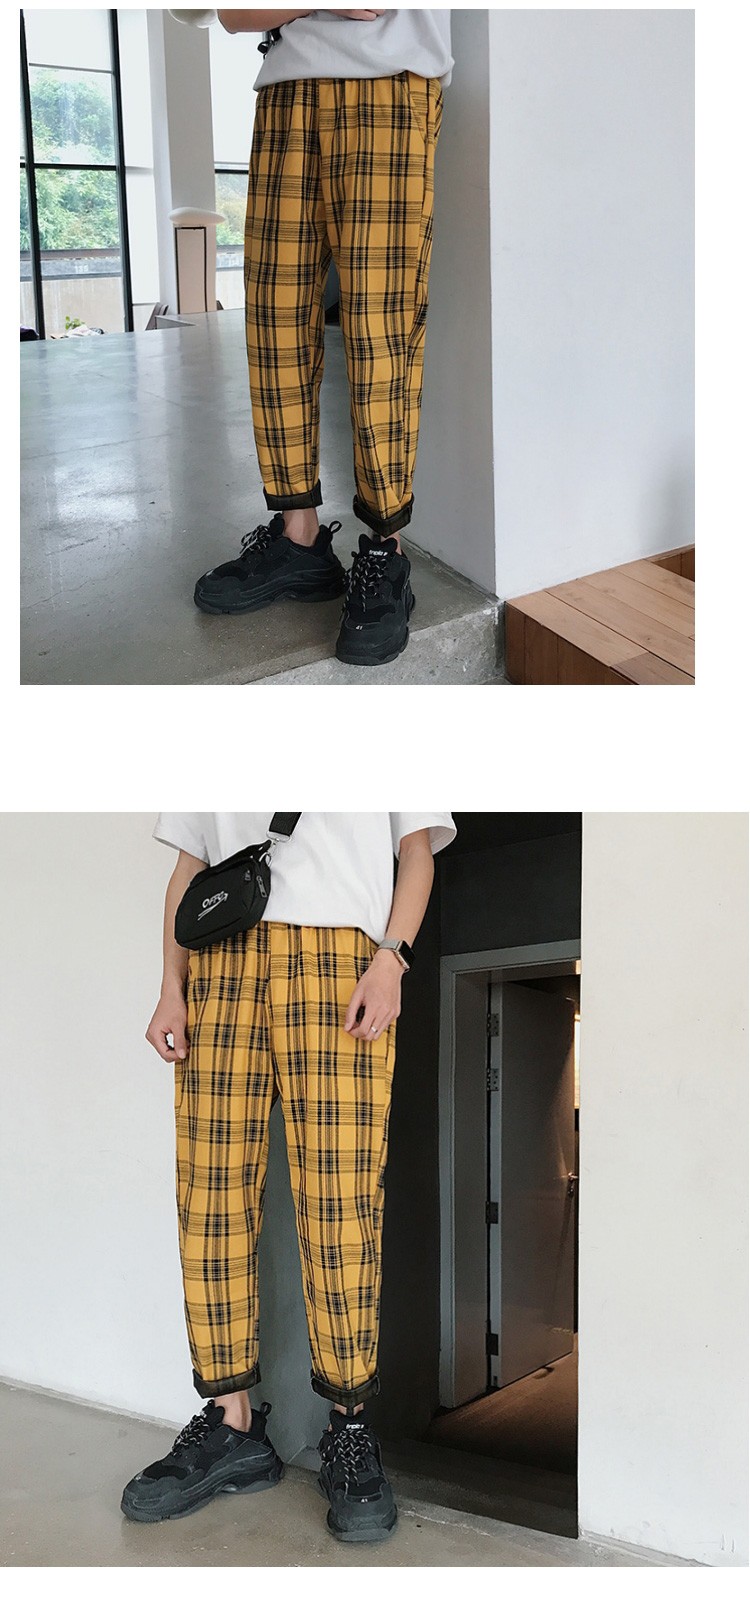 LAPPSTER Streetwear Yellow Plaid Pants Men Joggers 19 Man Casual Straight Harem Pants Men Korean Hip Hop Track Pants Plus Size 6